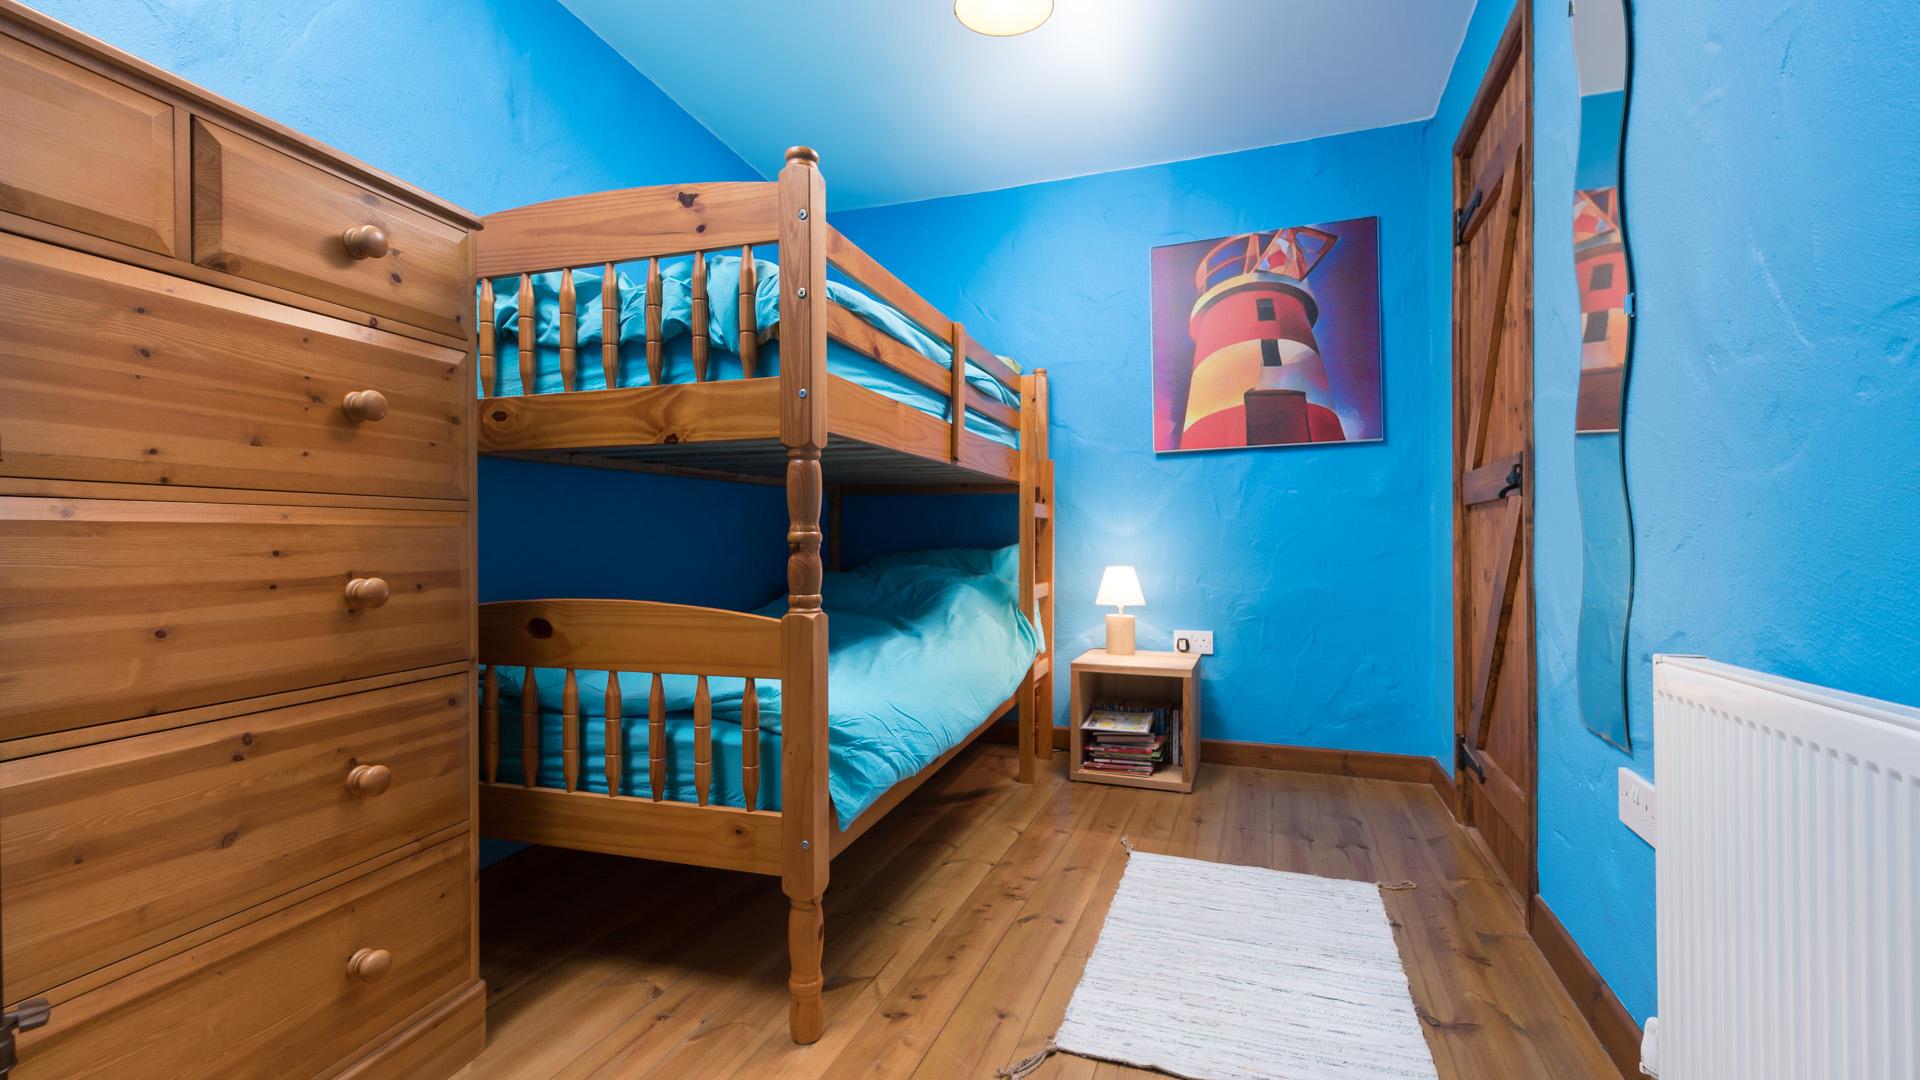 The Byre bunk bedroom